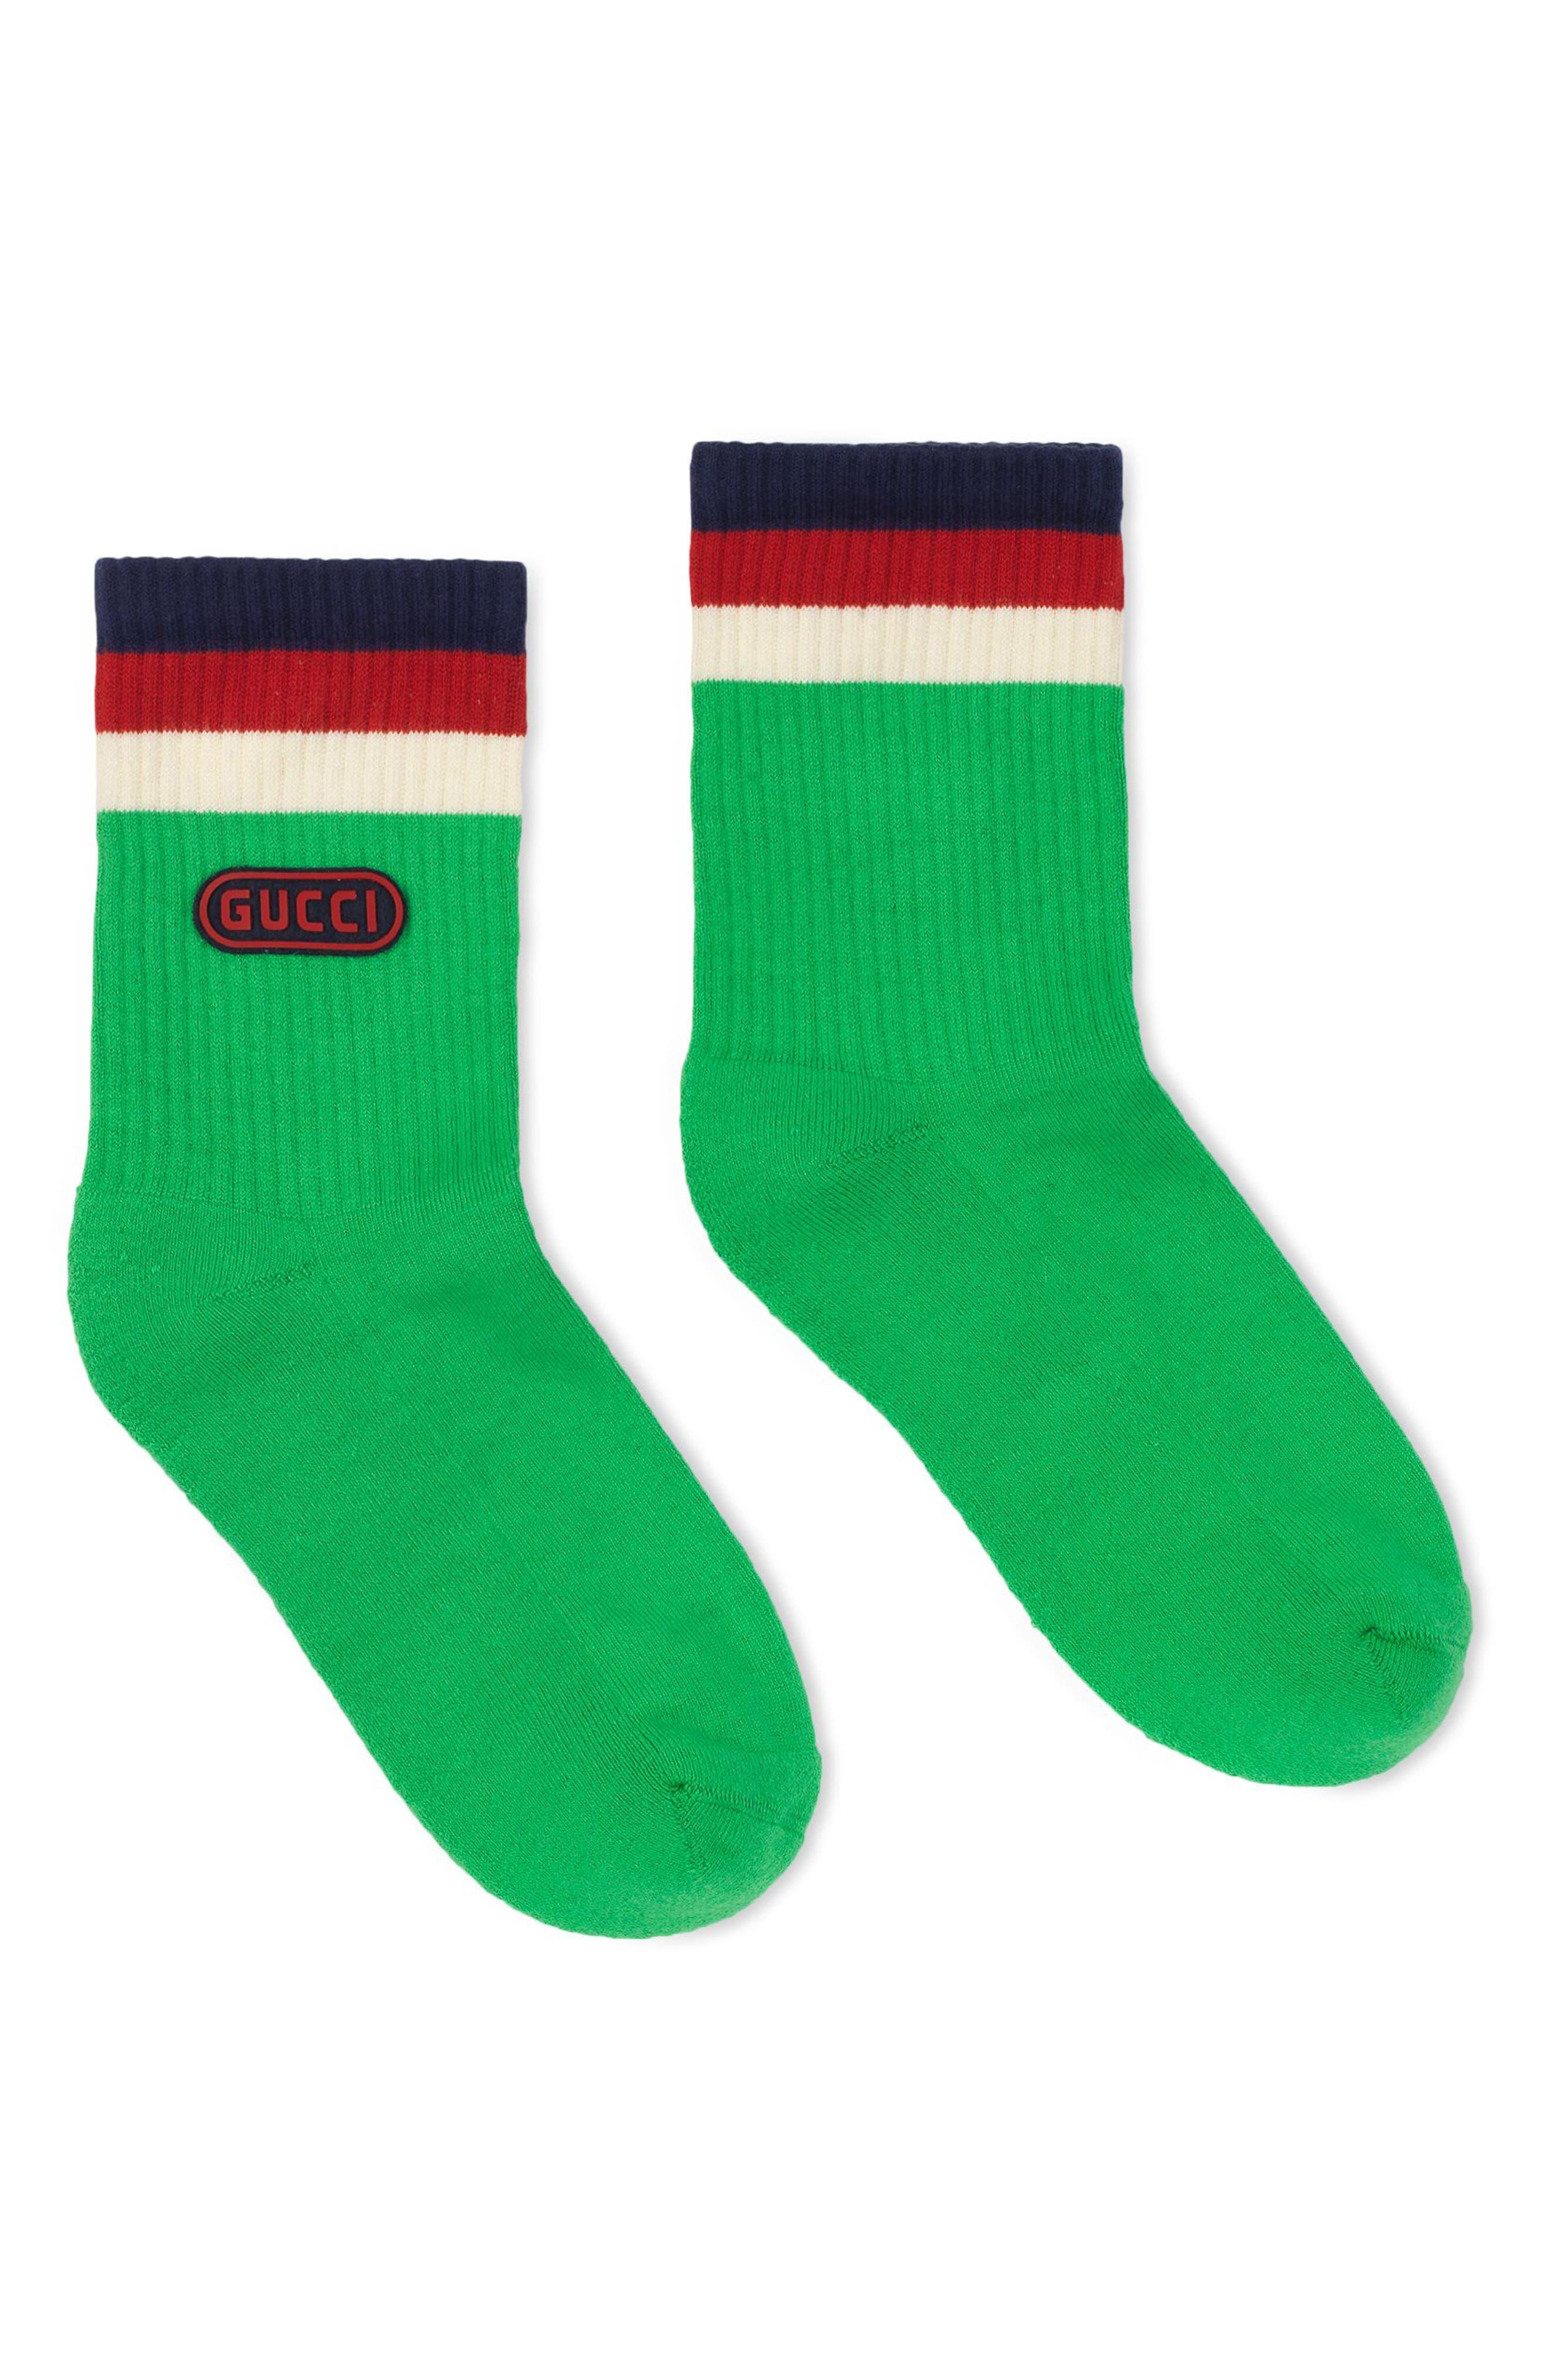 Logo Stamp Socks,                             Main thumbnail 1, color,                             Grass Green